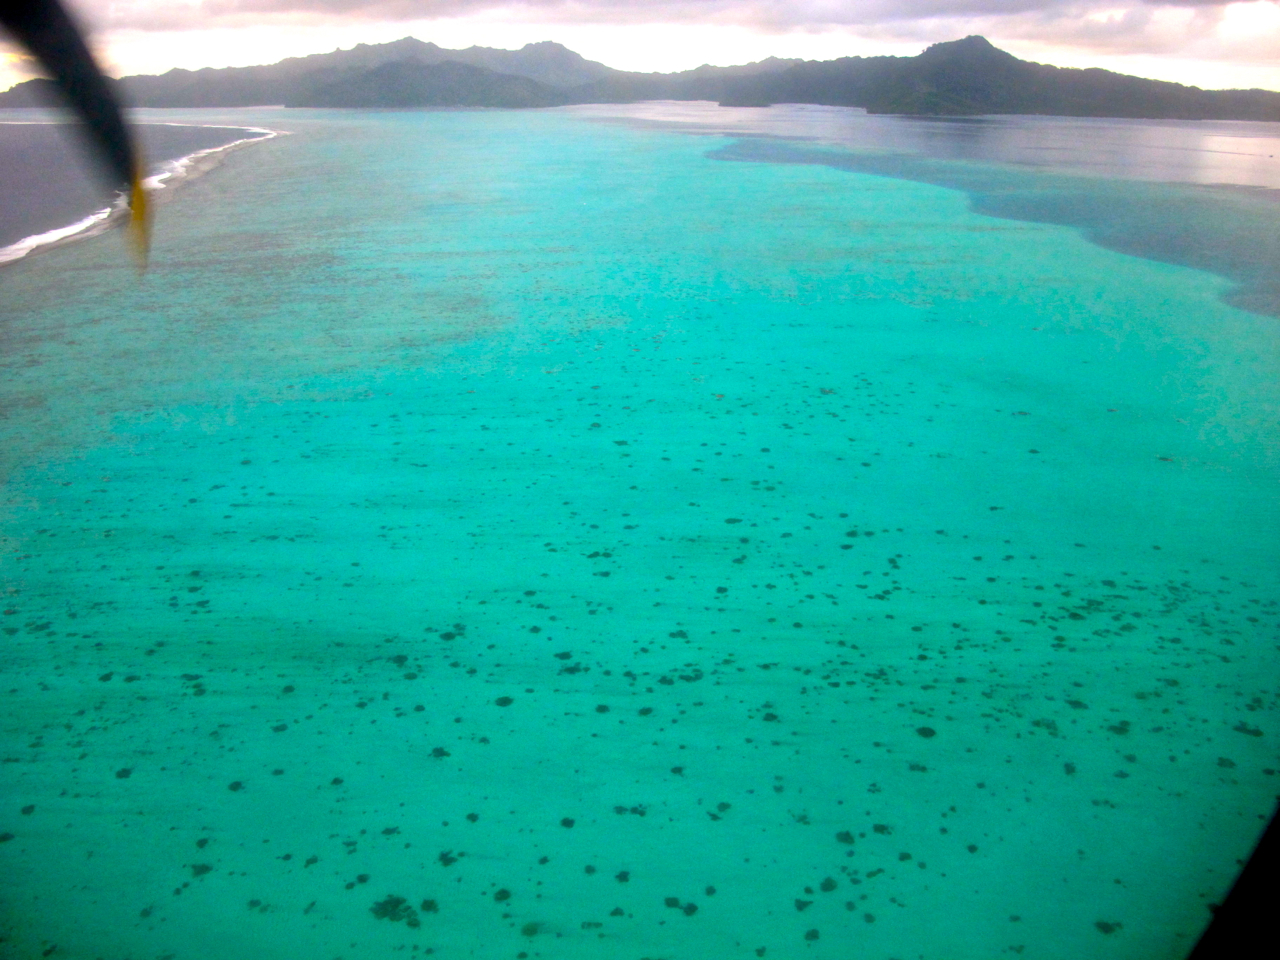 Raiatea aerial photograph